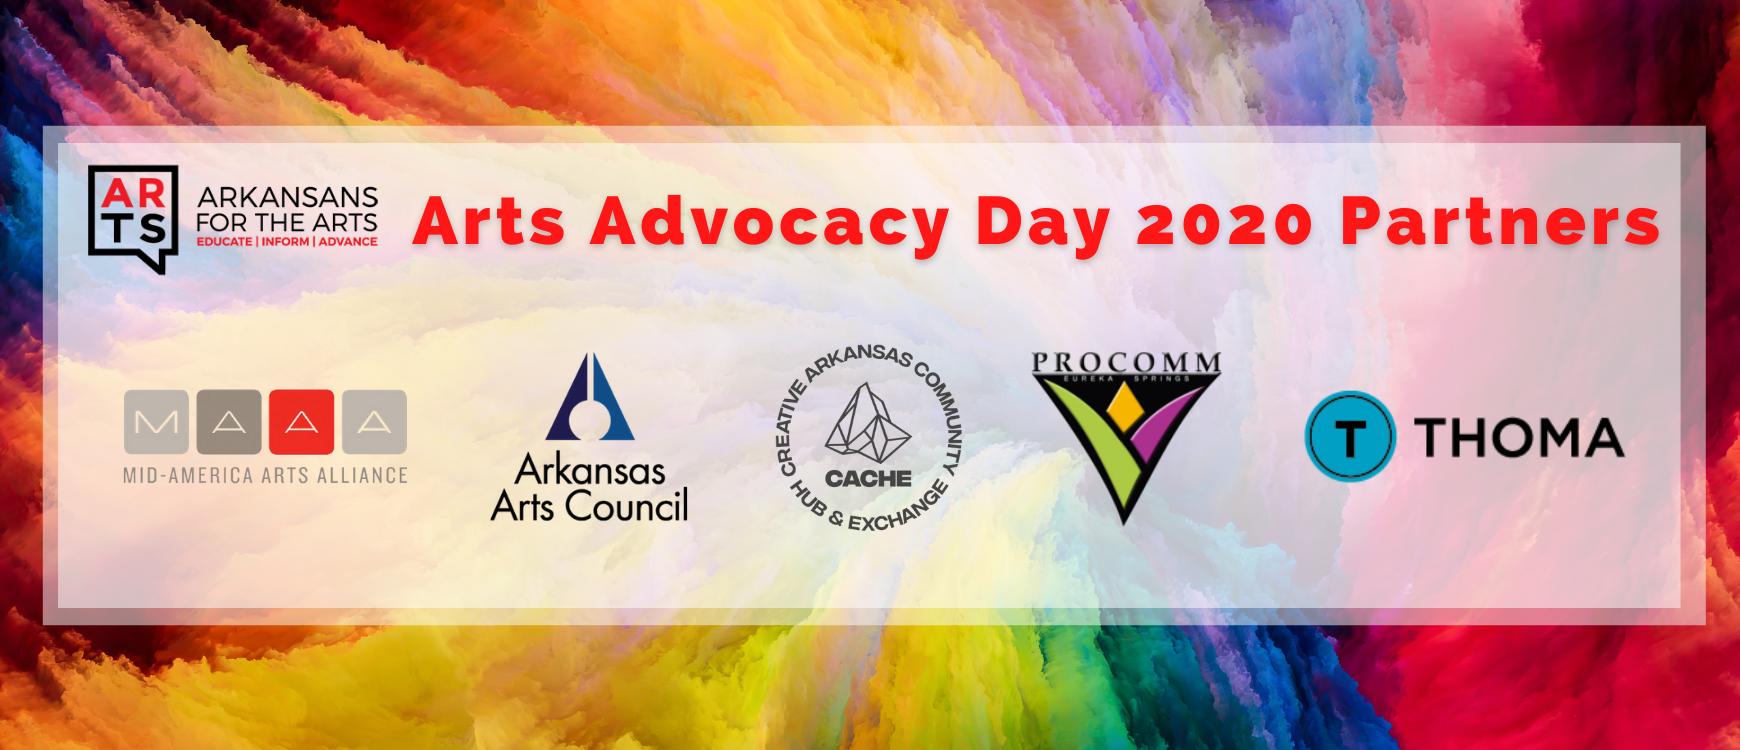 Arkansans for the Arts | Arts Advocacy Day 2020 Partners | Mid-America Arts Alliance, Arkansas Arts Council, Creative Arkansas Community Hub and Exchange, ProCommEureka, Thoma Thoma